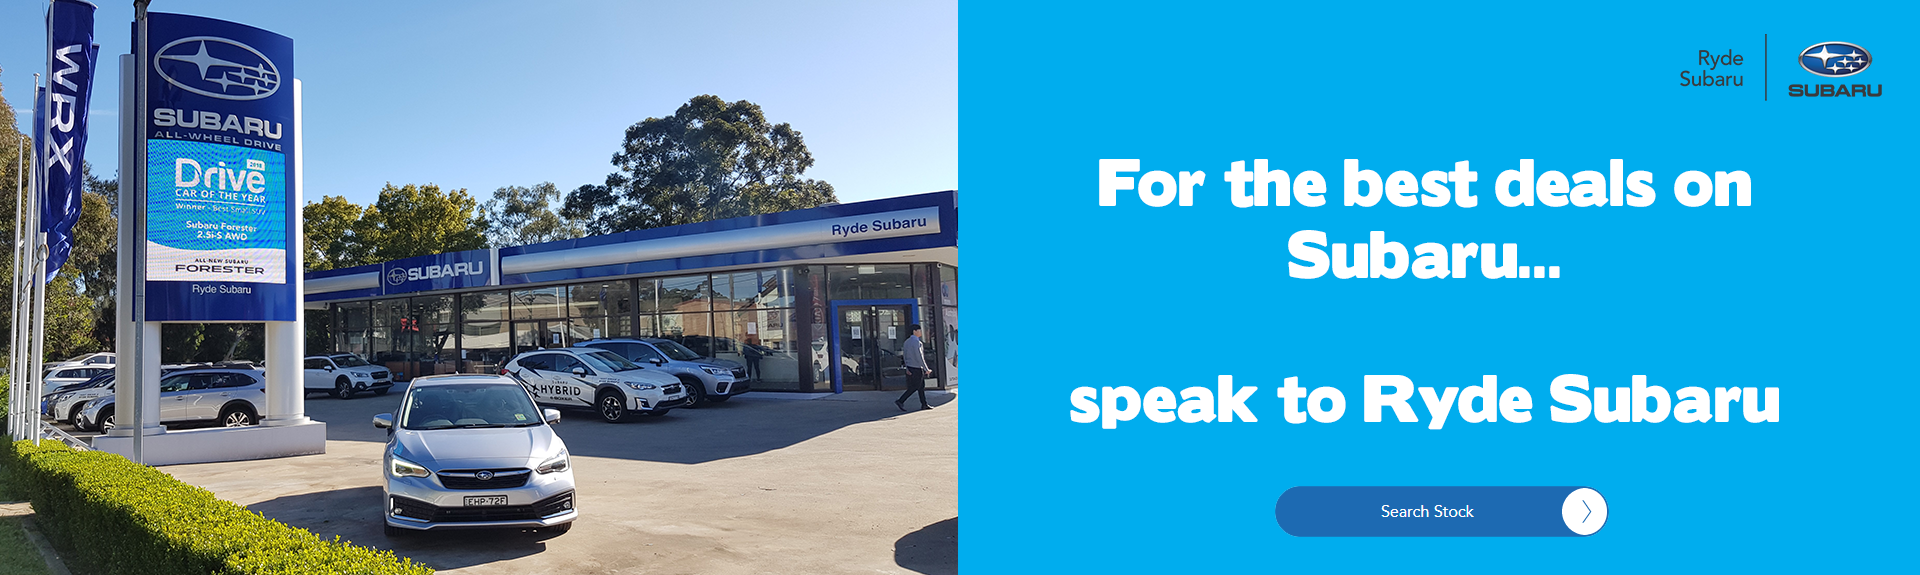 Ryde Subaru customer service leader